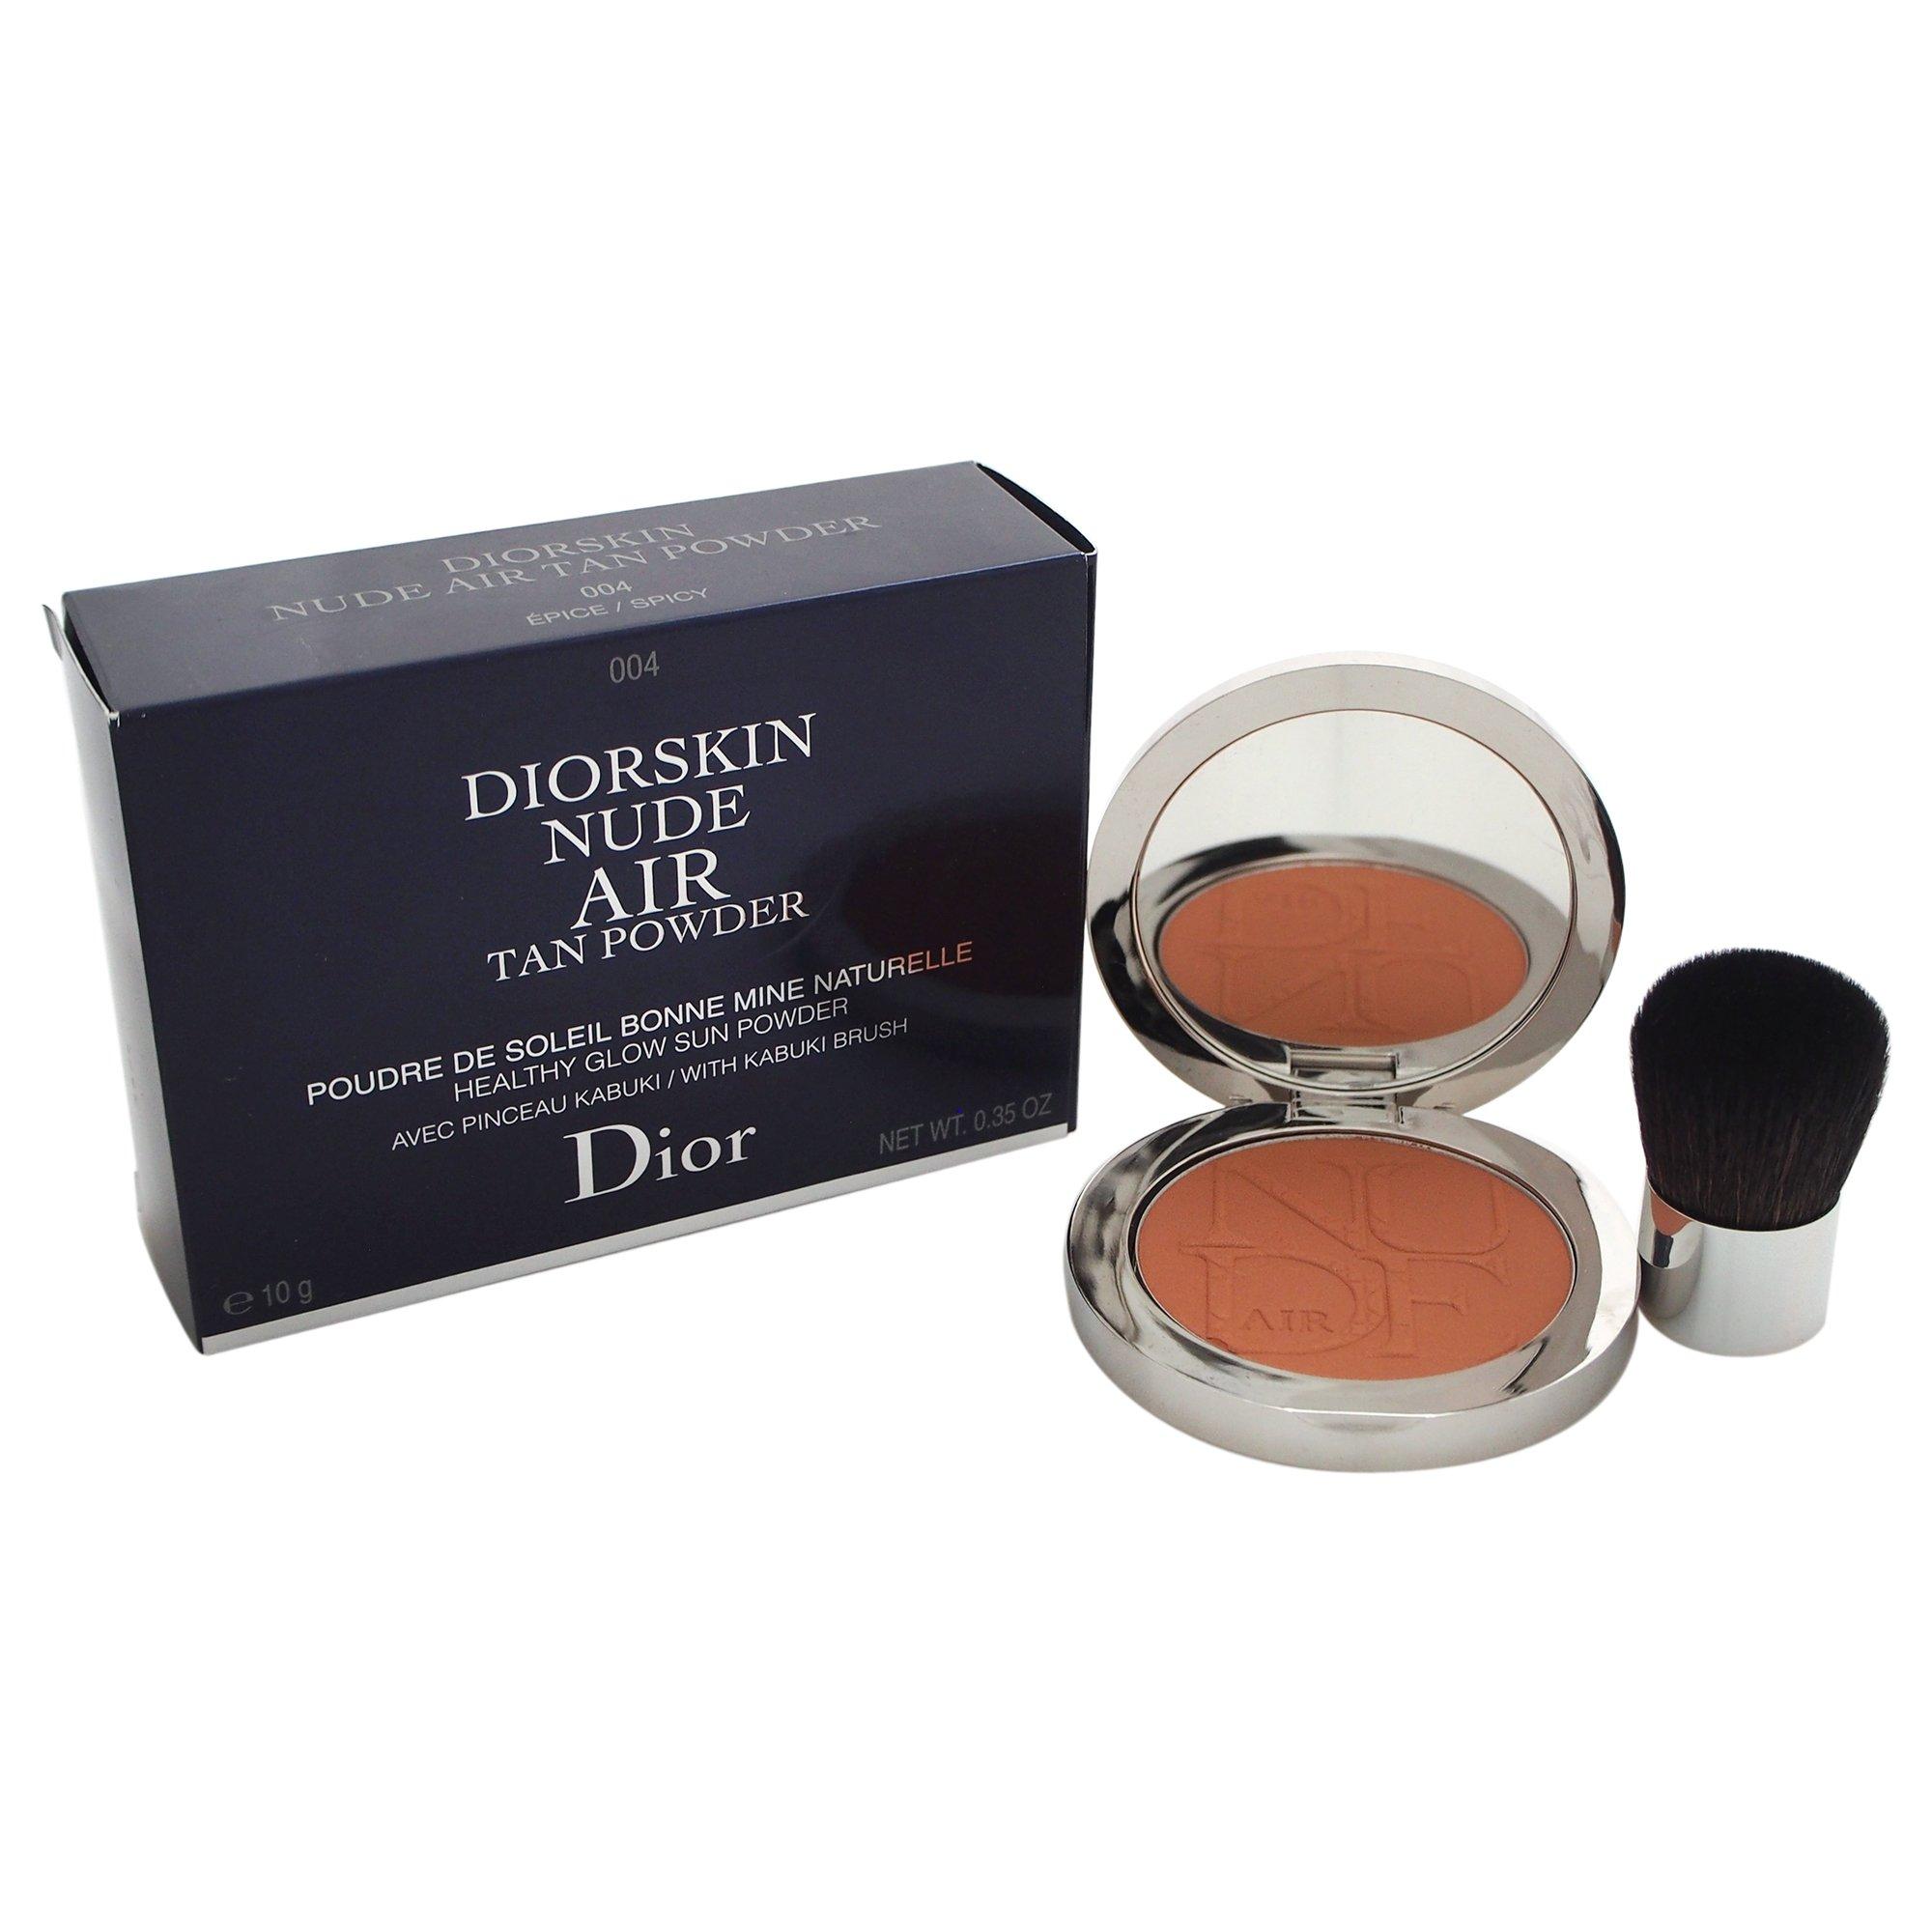 Christian Dior Diorskin Nude Air Tan Powder for Women, Spicy, 0.33 Ounce